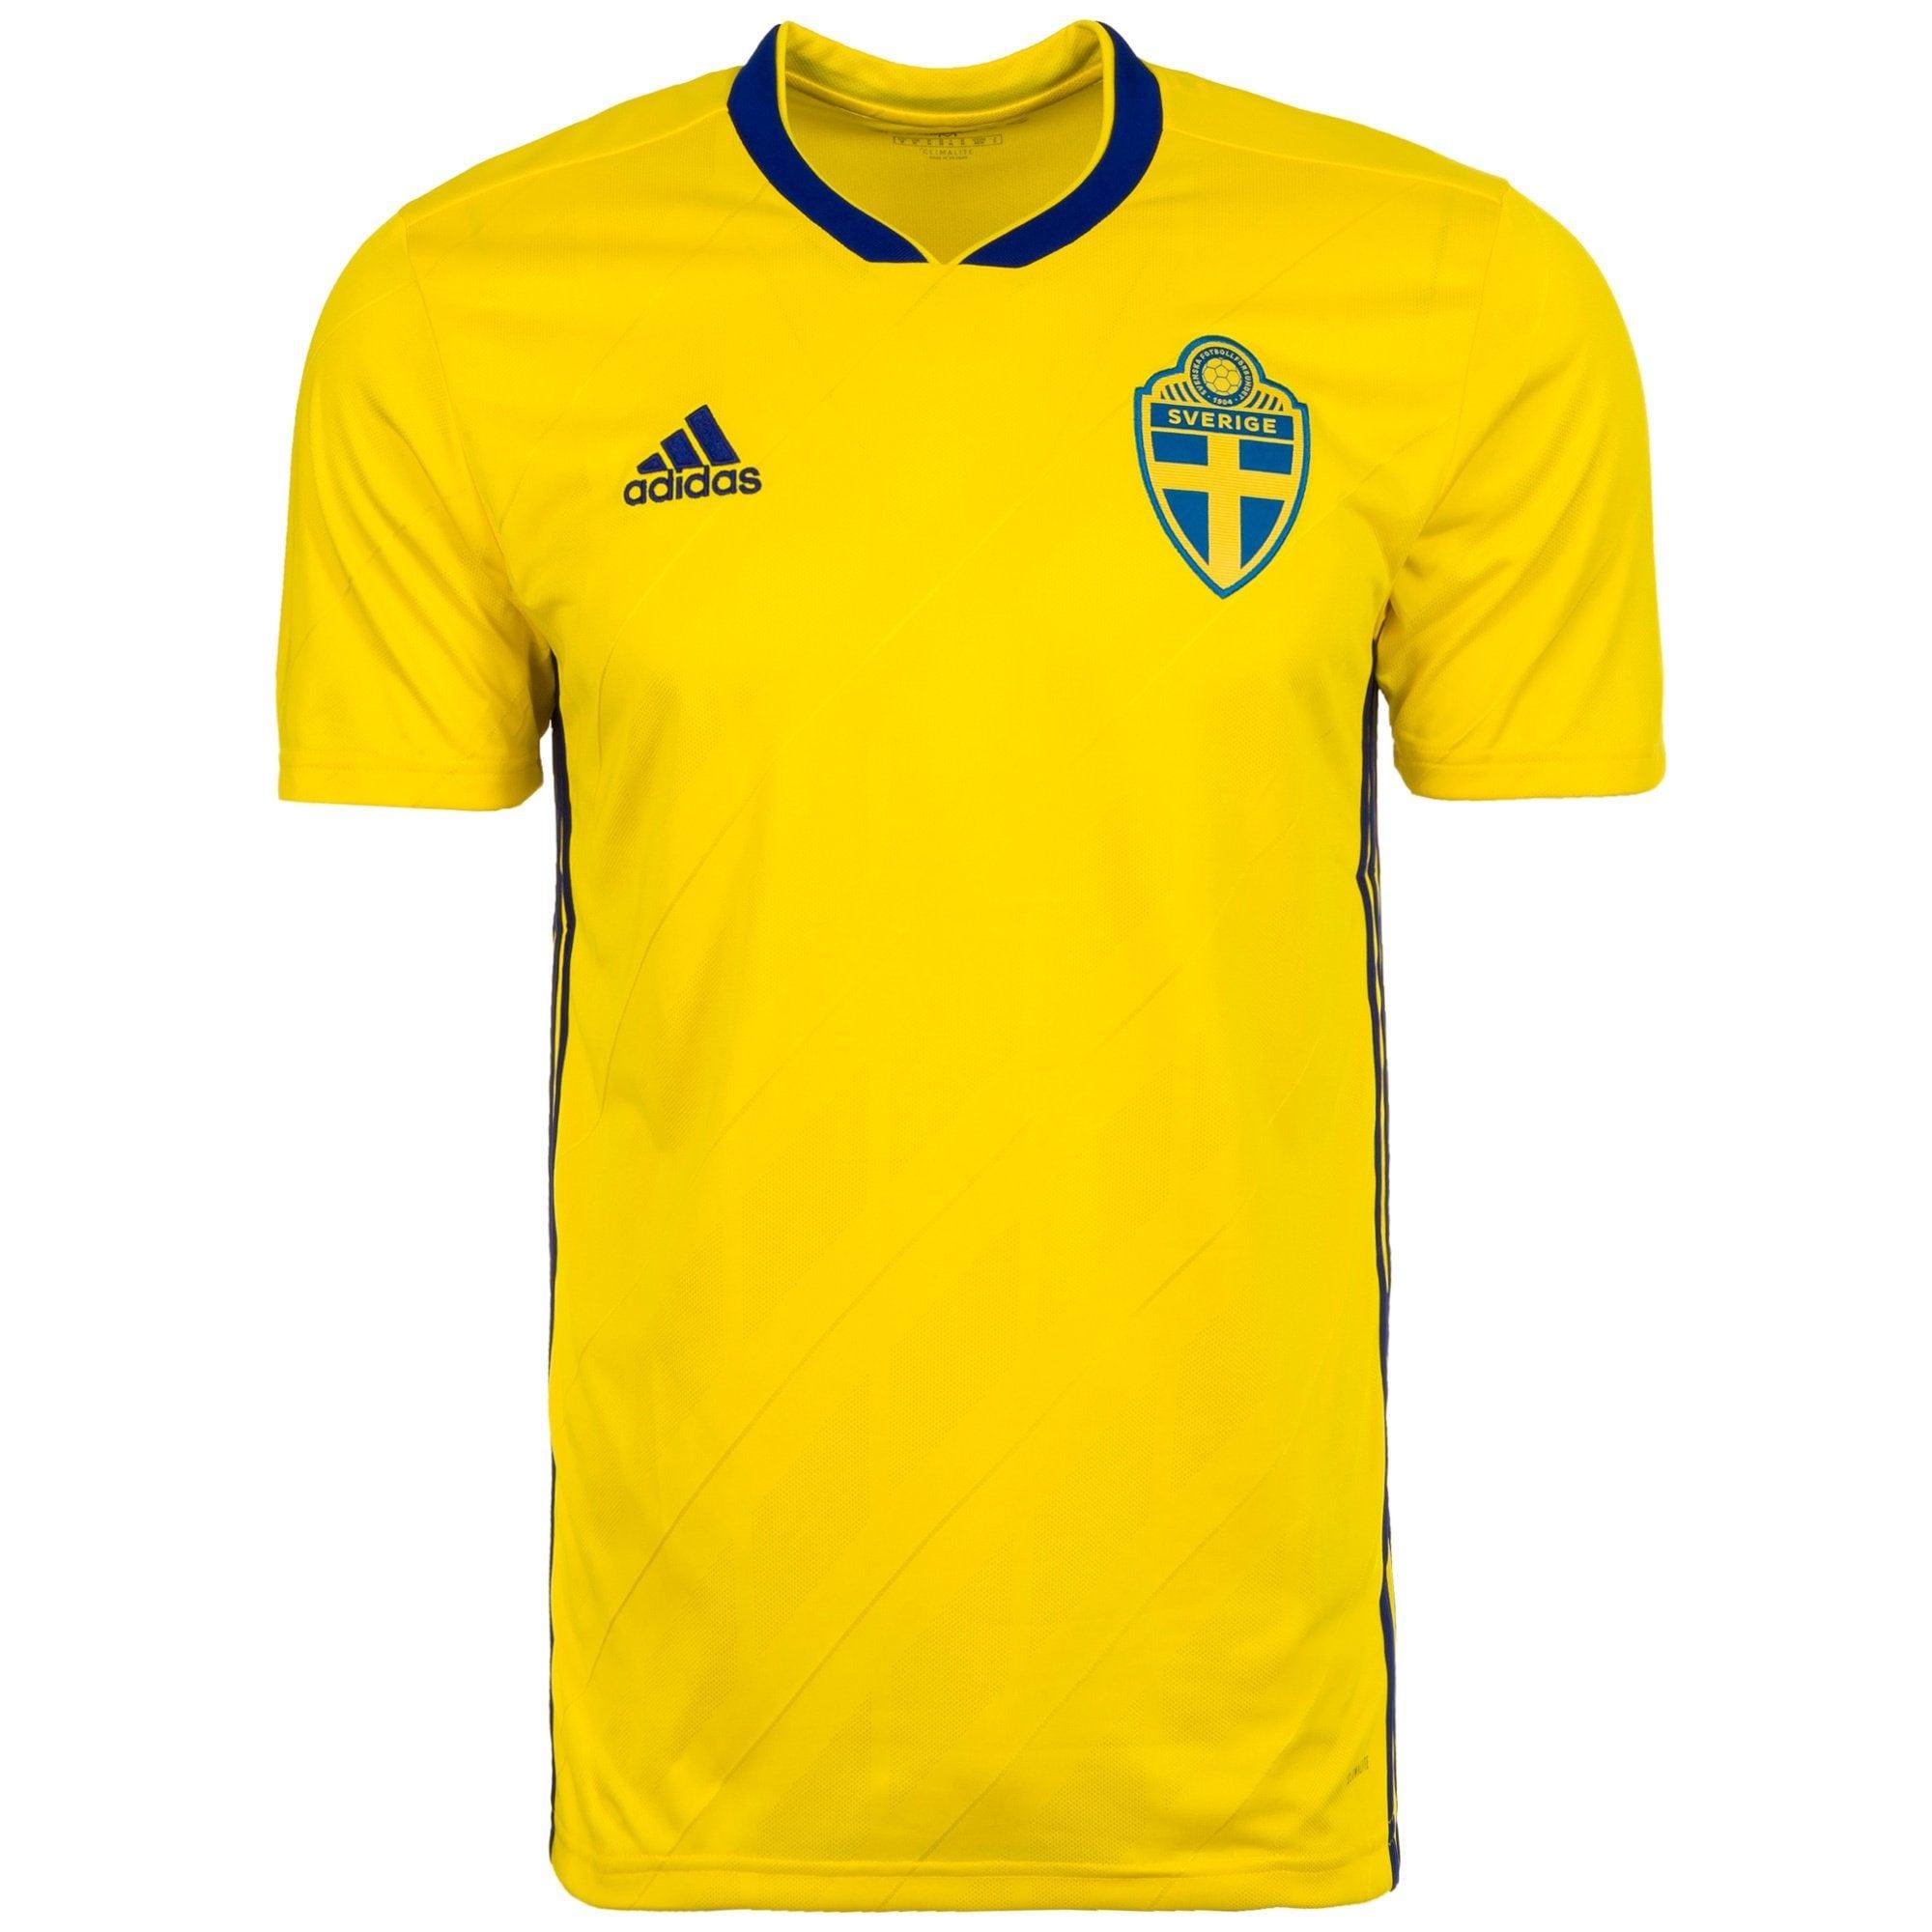 adidas Performance Fußballtrikot Schweden Trikot Heim   Sportbekleidung > Trikots > Fußballtrikots   Adidas Performance